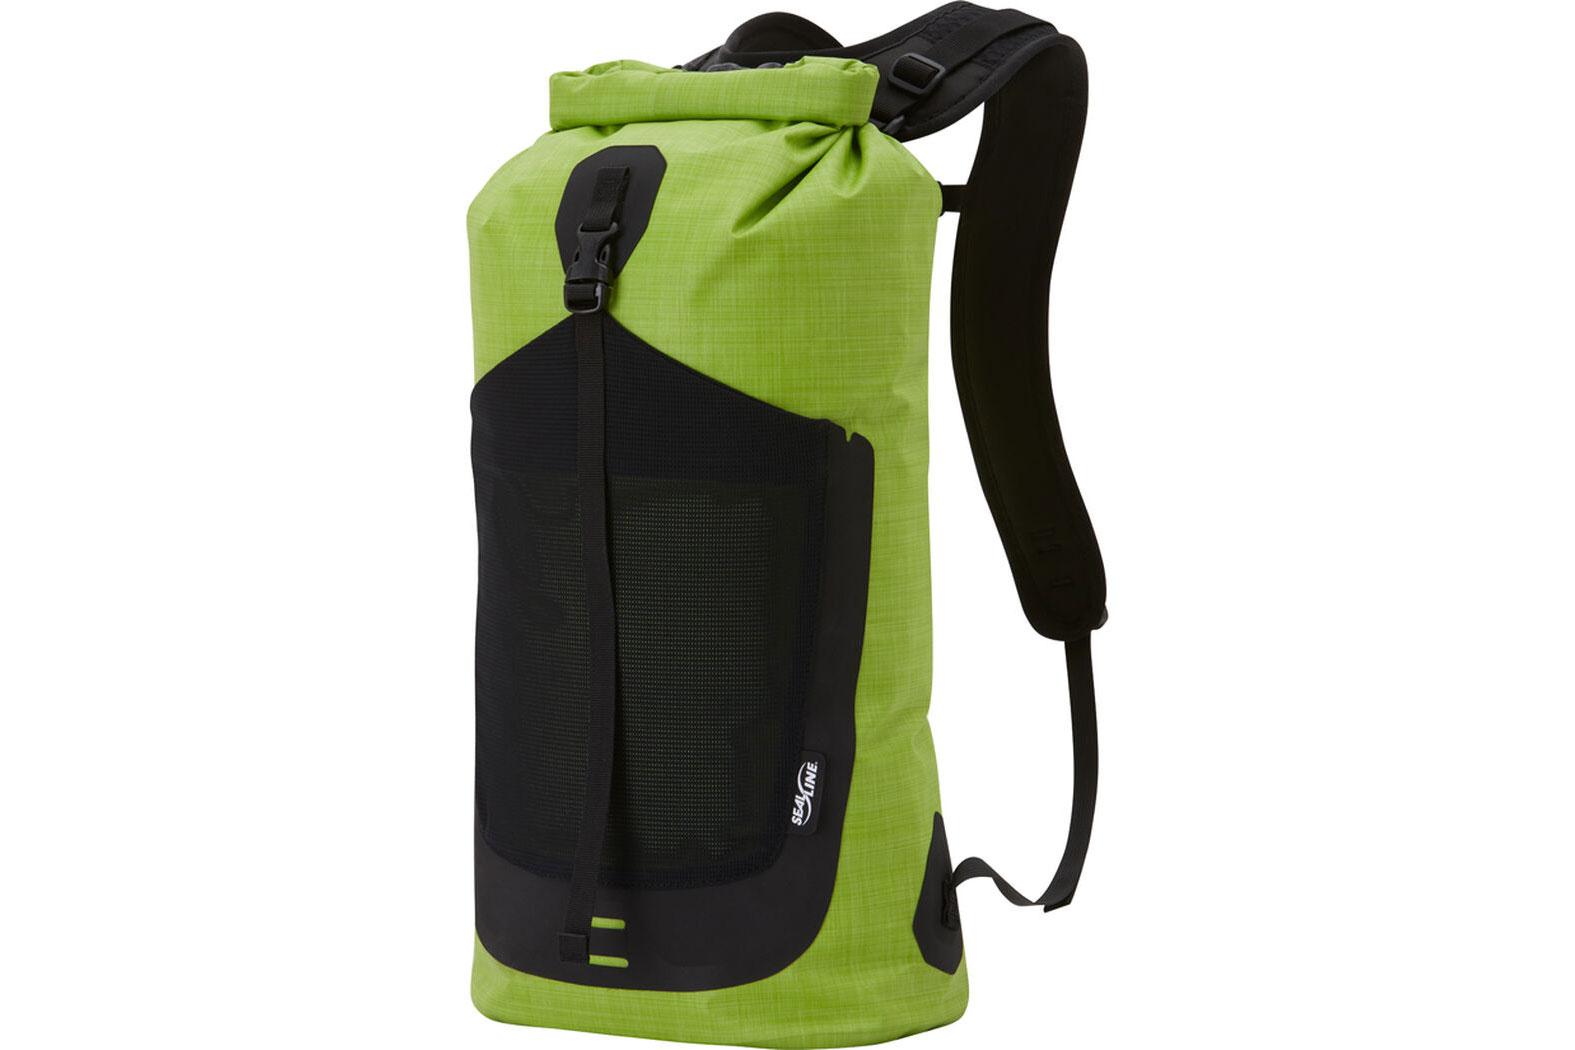 SealLine Skylake dry bag